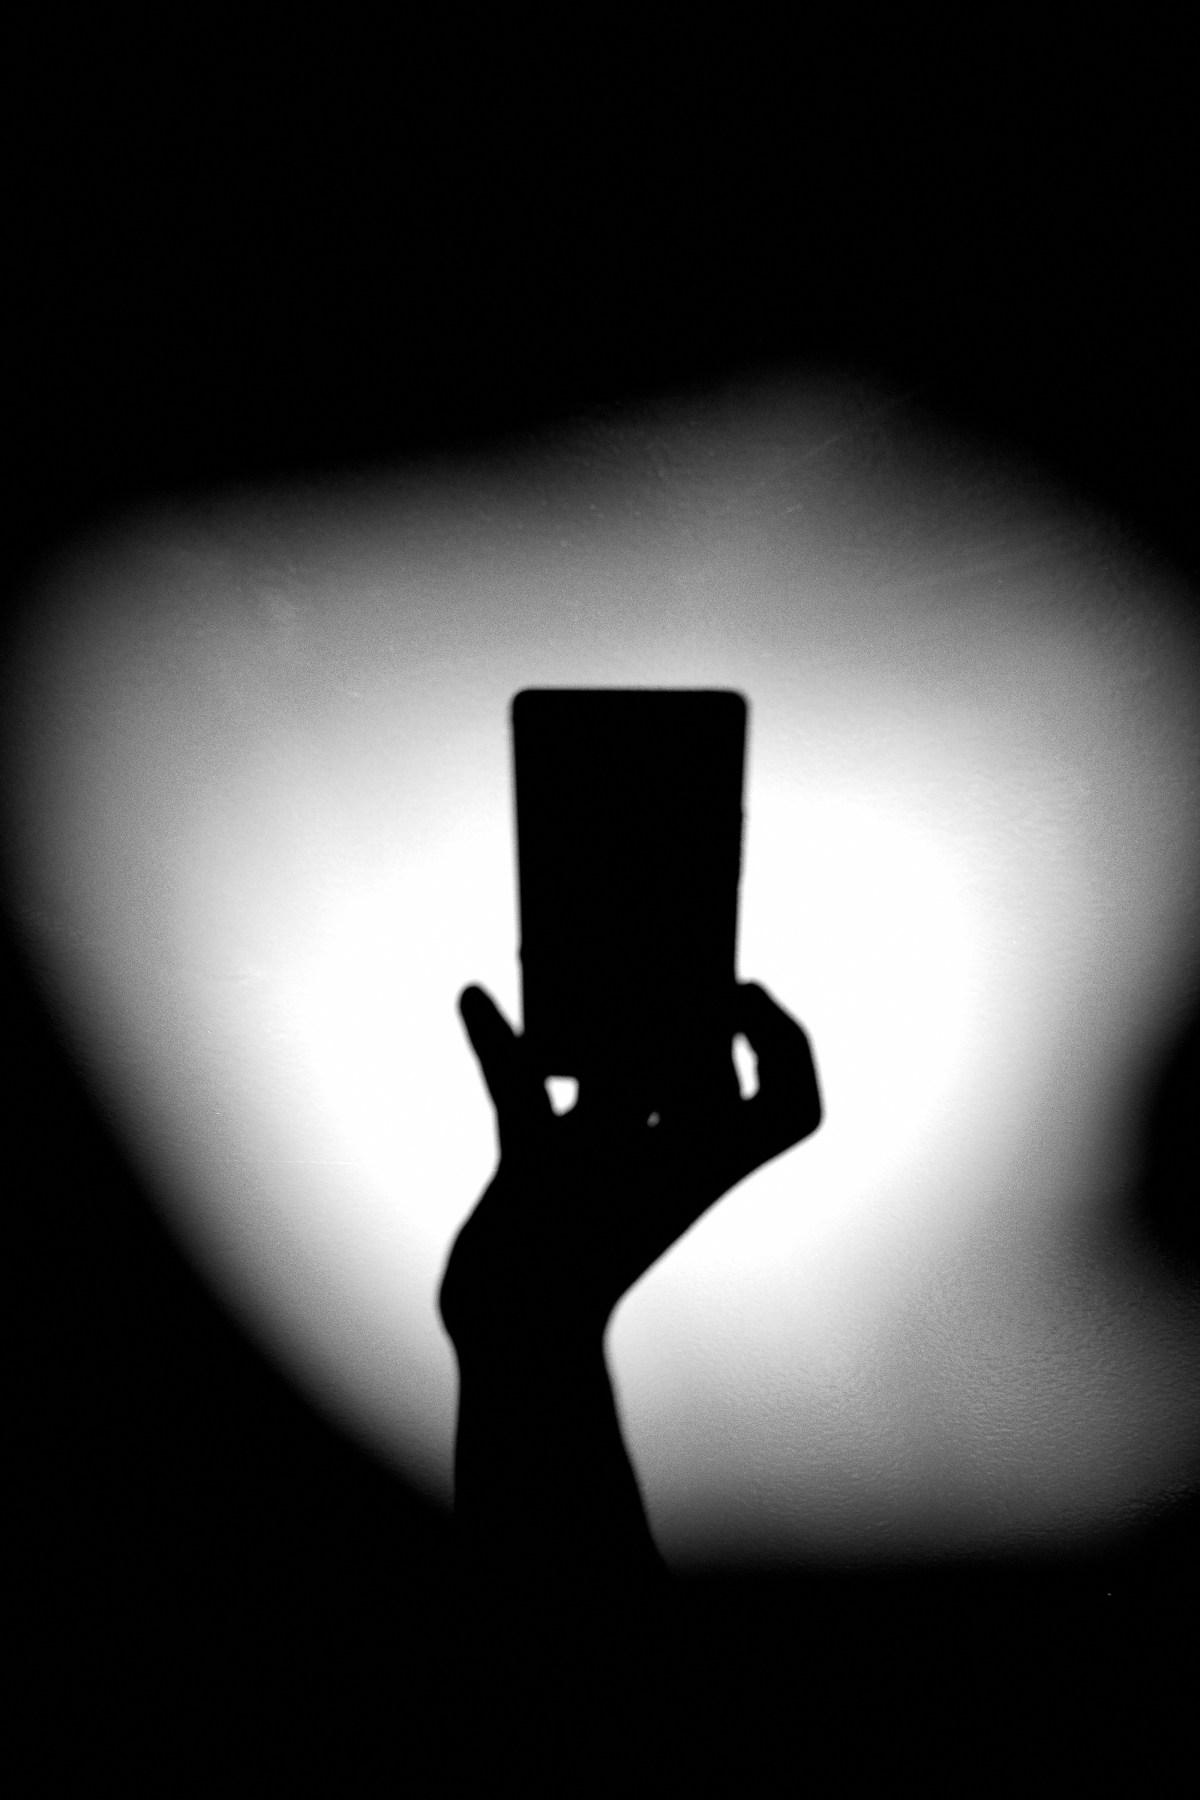 Ricoh GR III selfie.